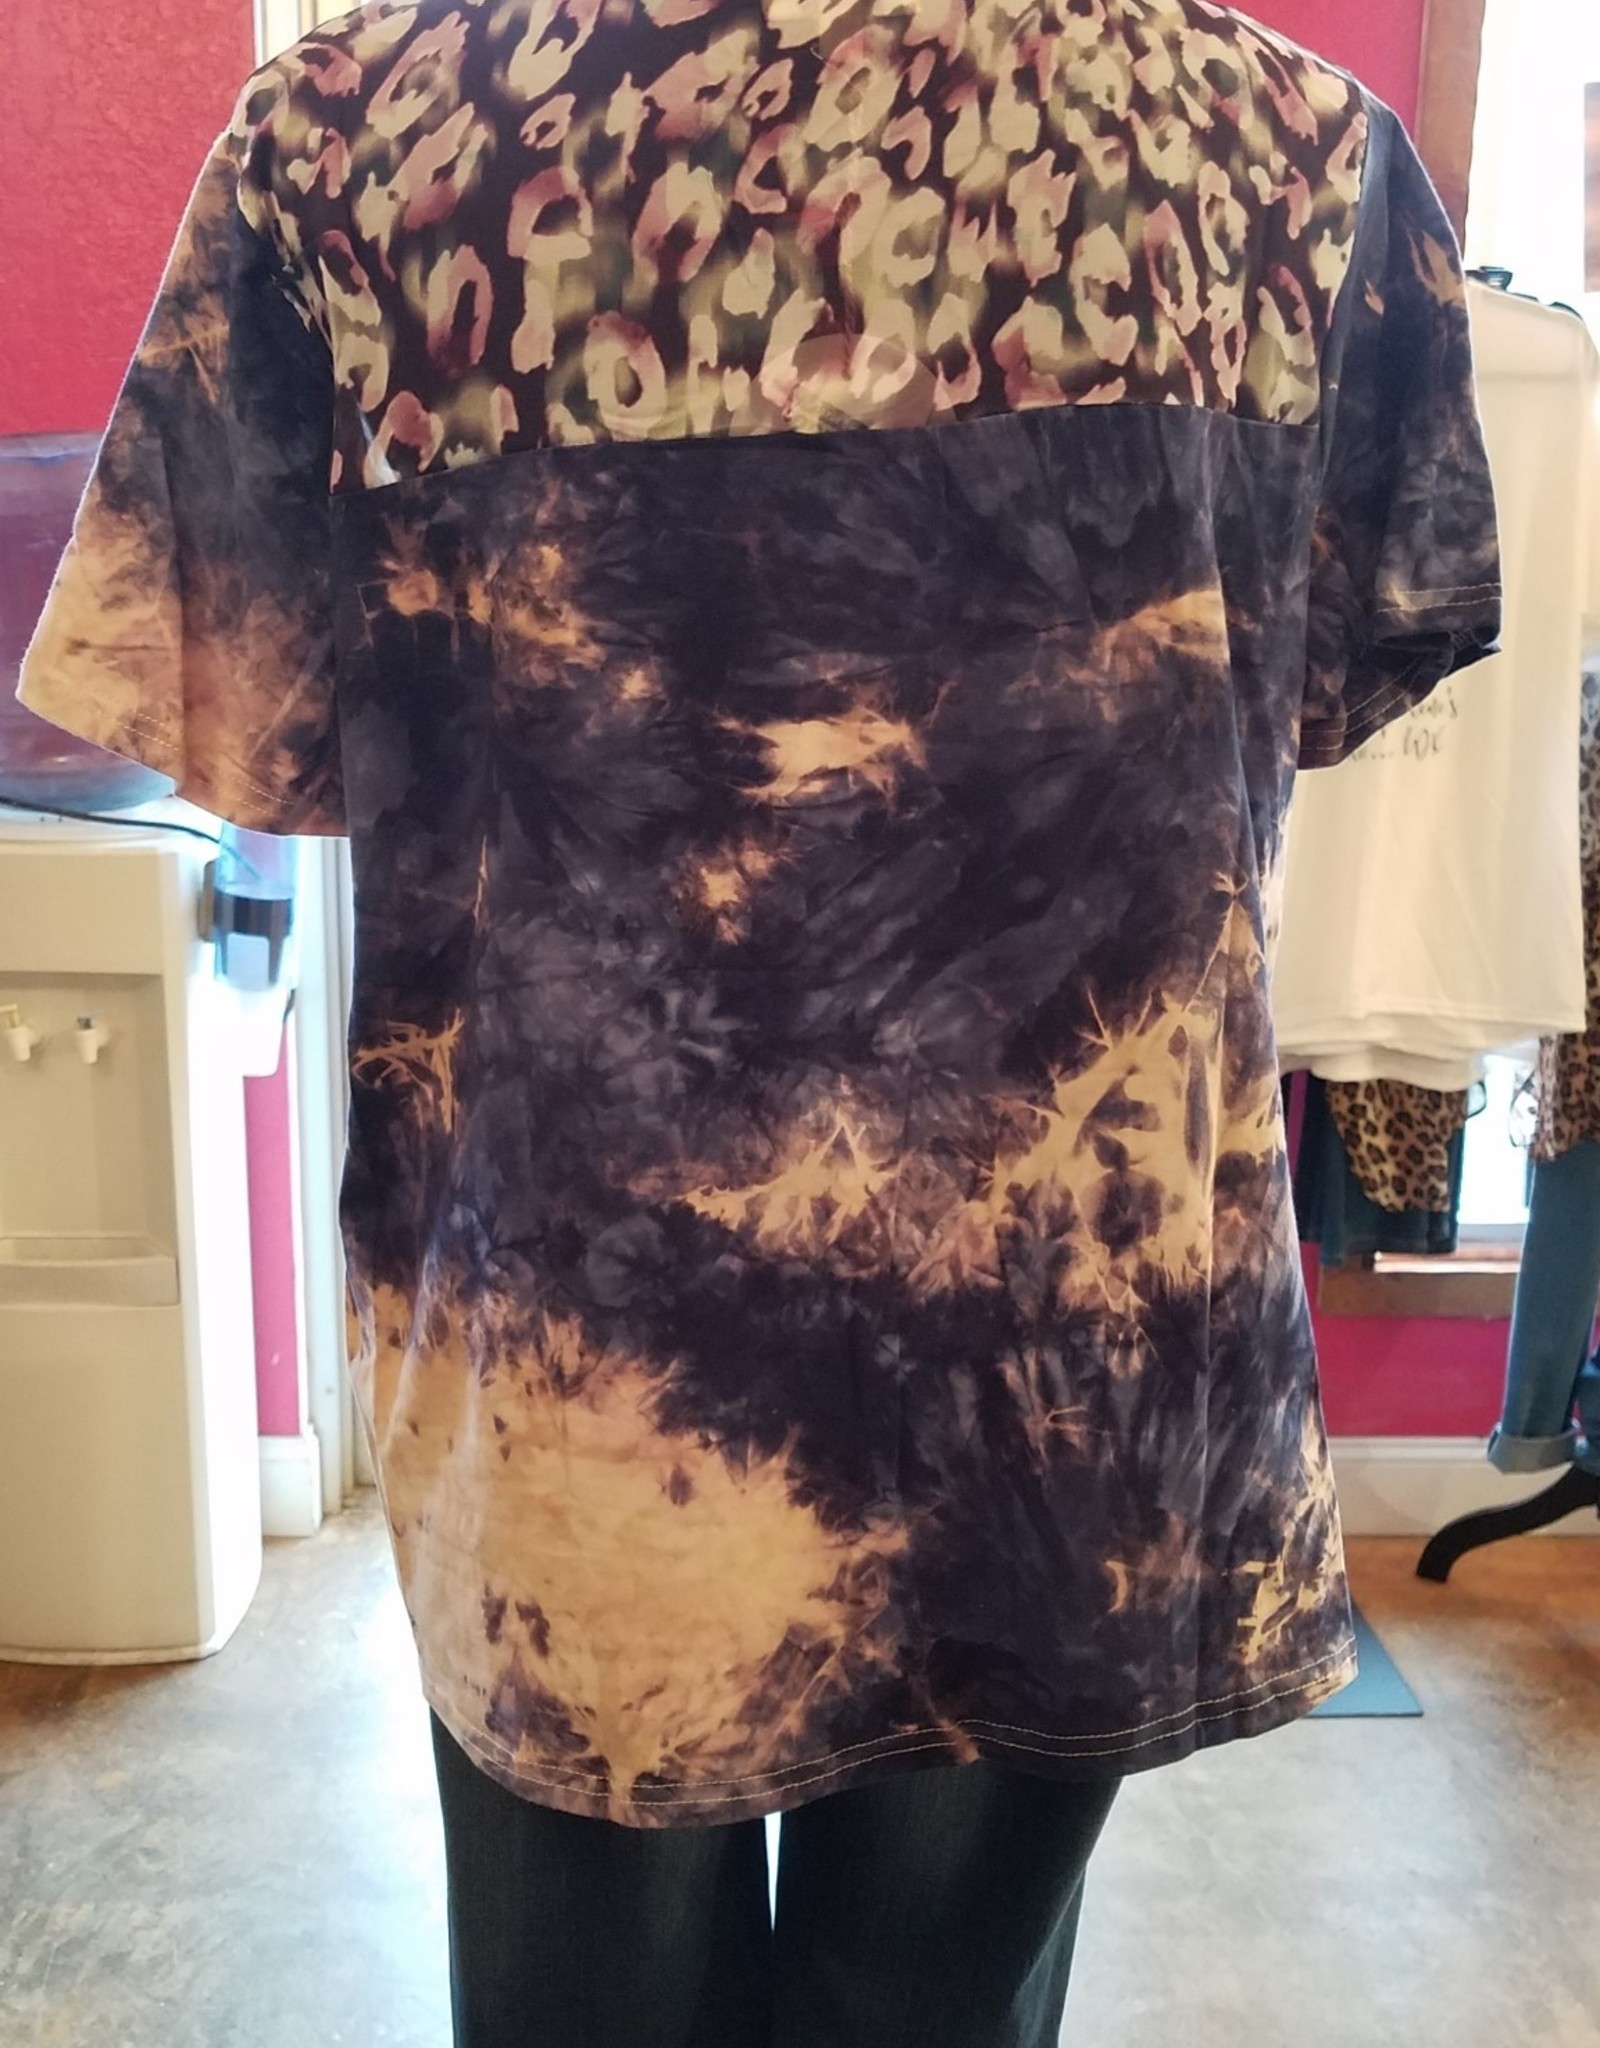 Tye Dye S/S Sheer Amimal Print Yoke Top